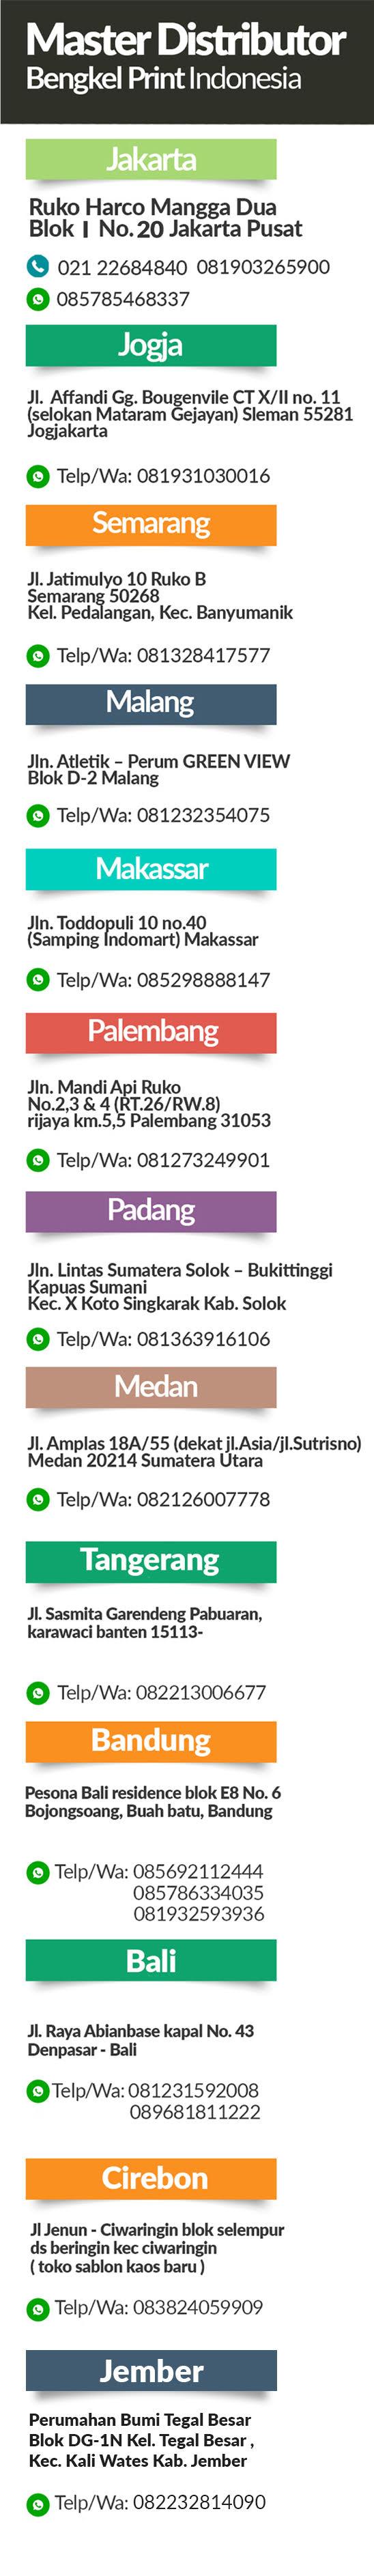 Alamat dealer dan cabang bengkel print indonesia 2019